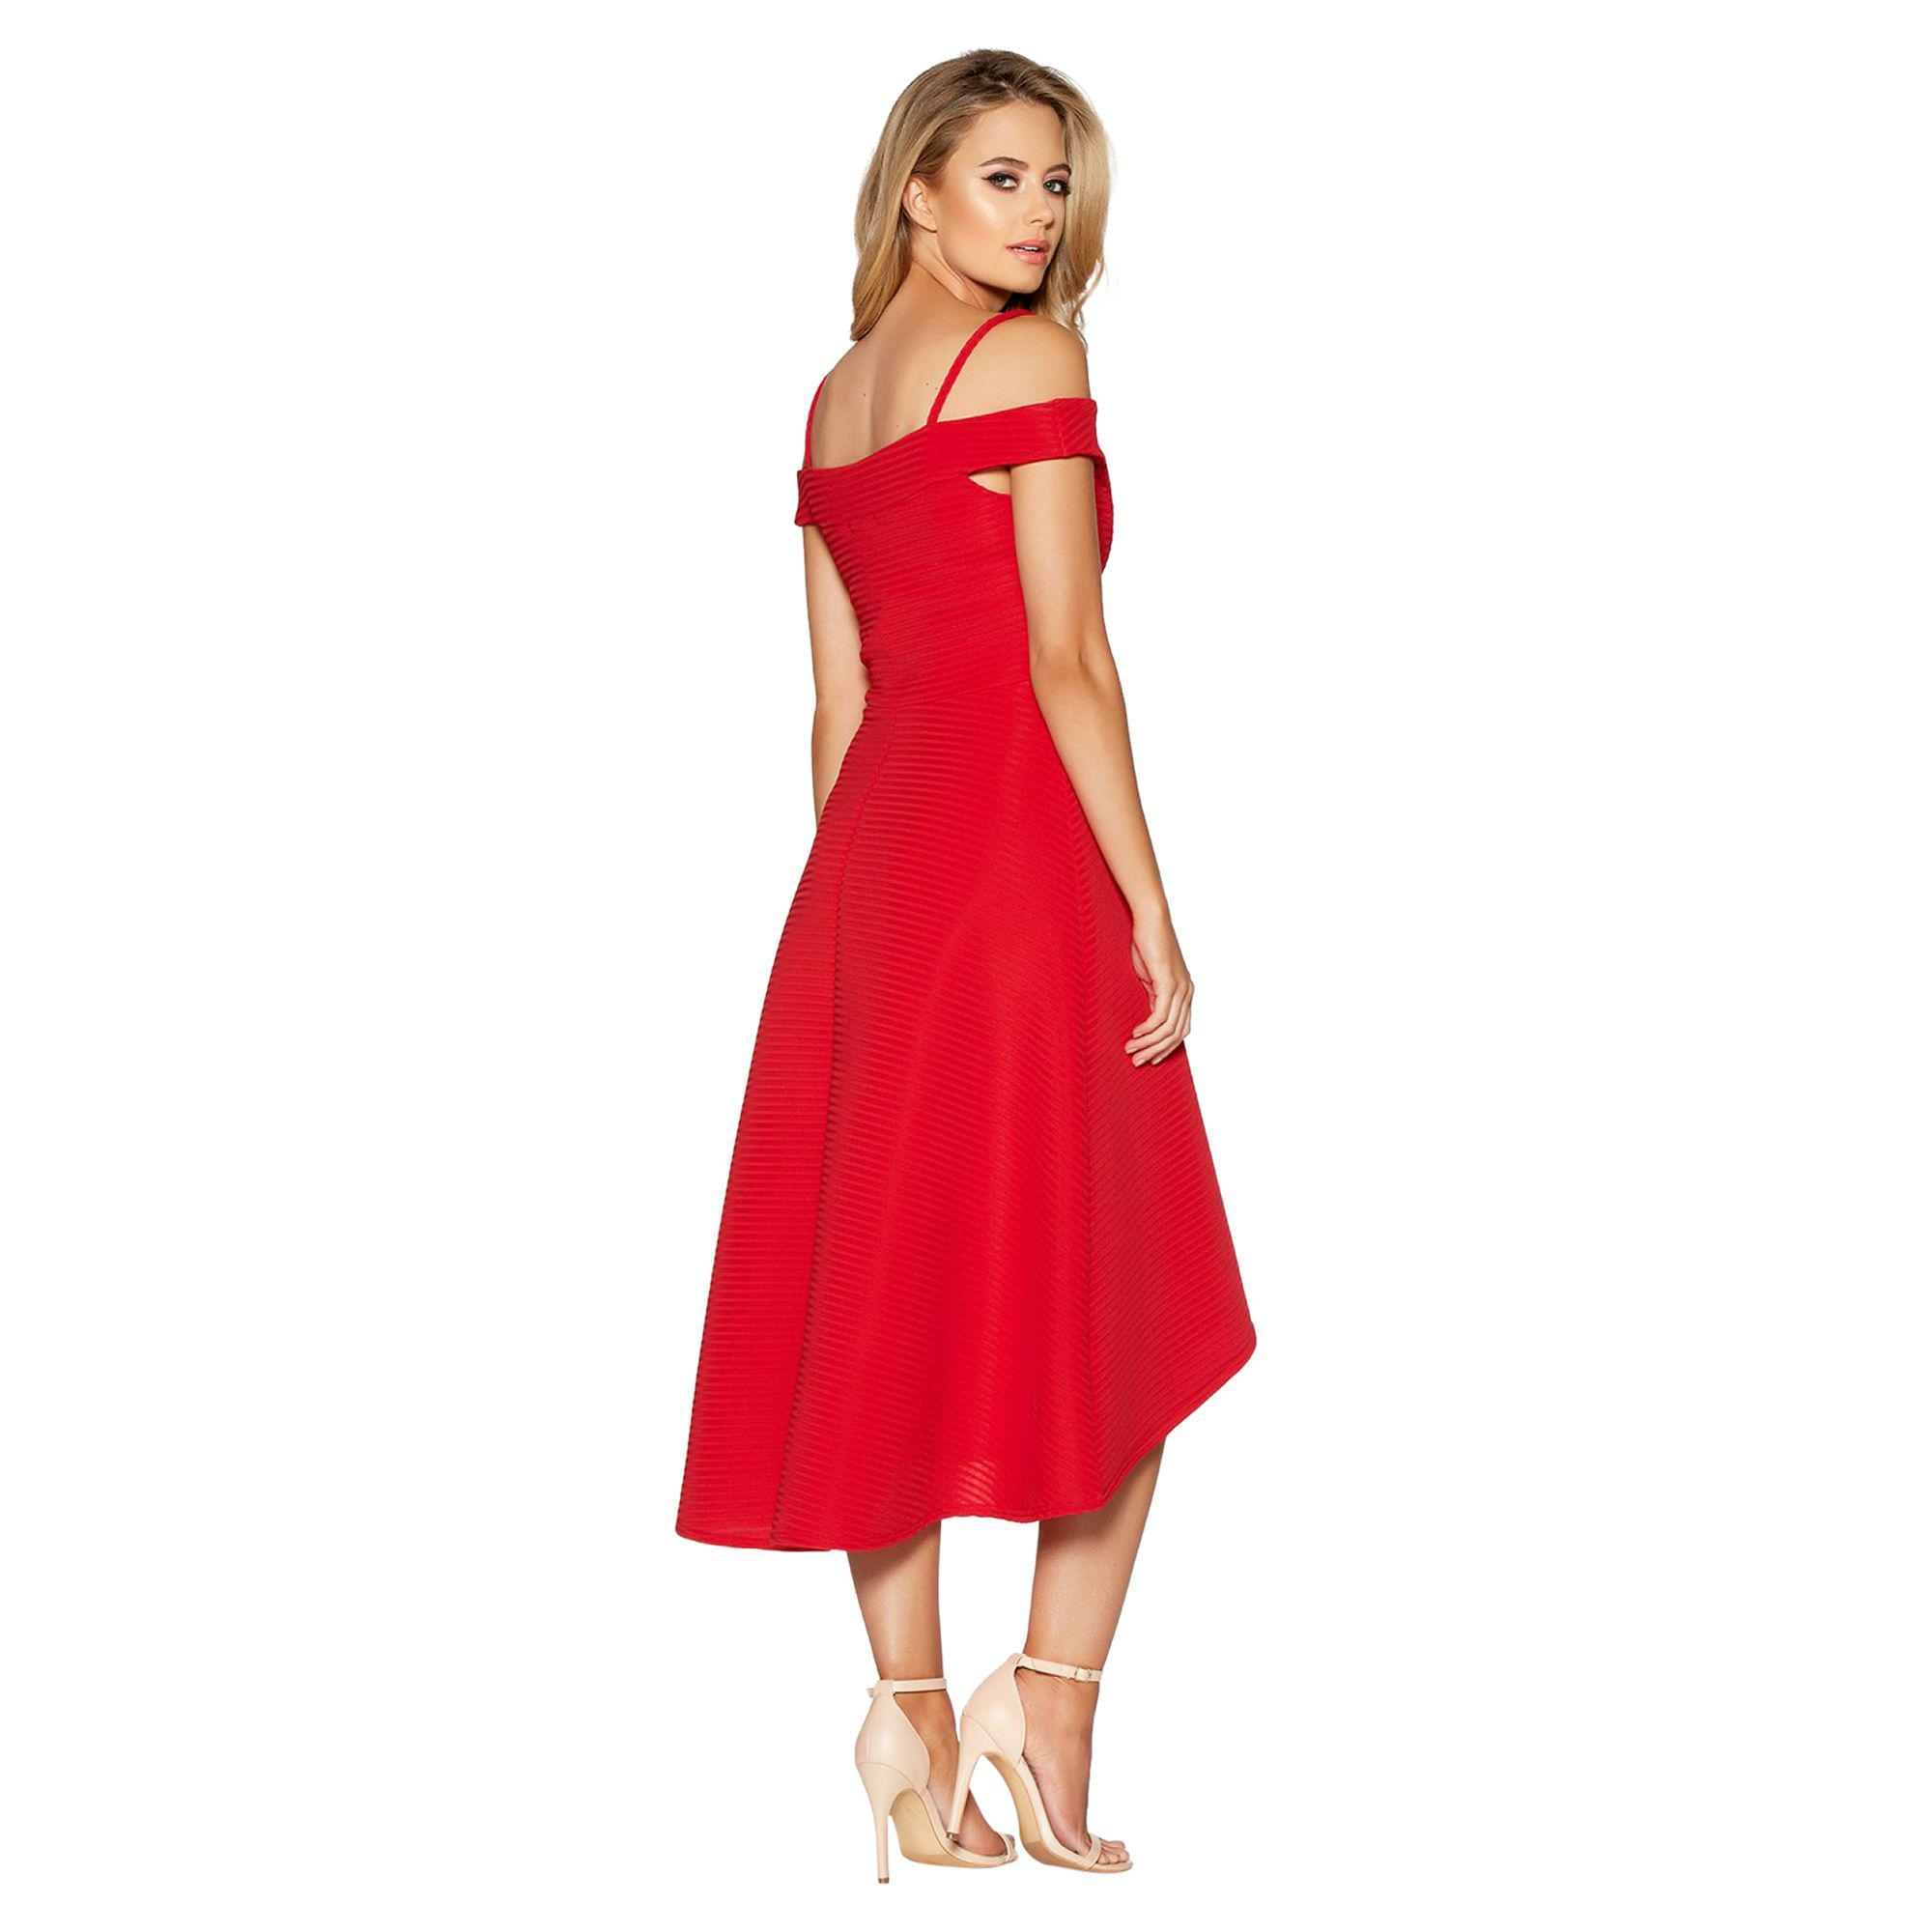 e29caad618 Quiz - Red Sweetheart Neck Strappy Bardot Dress - Lyst. View fullscreen